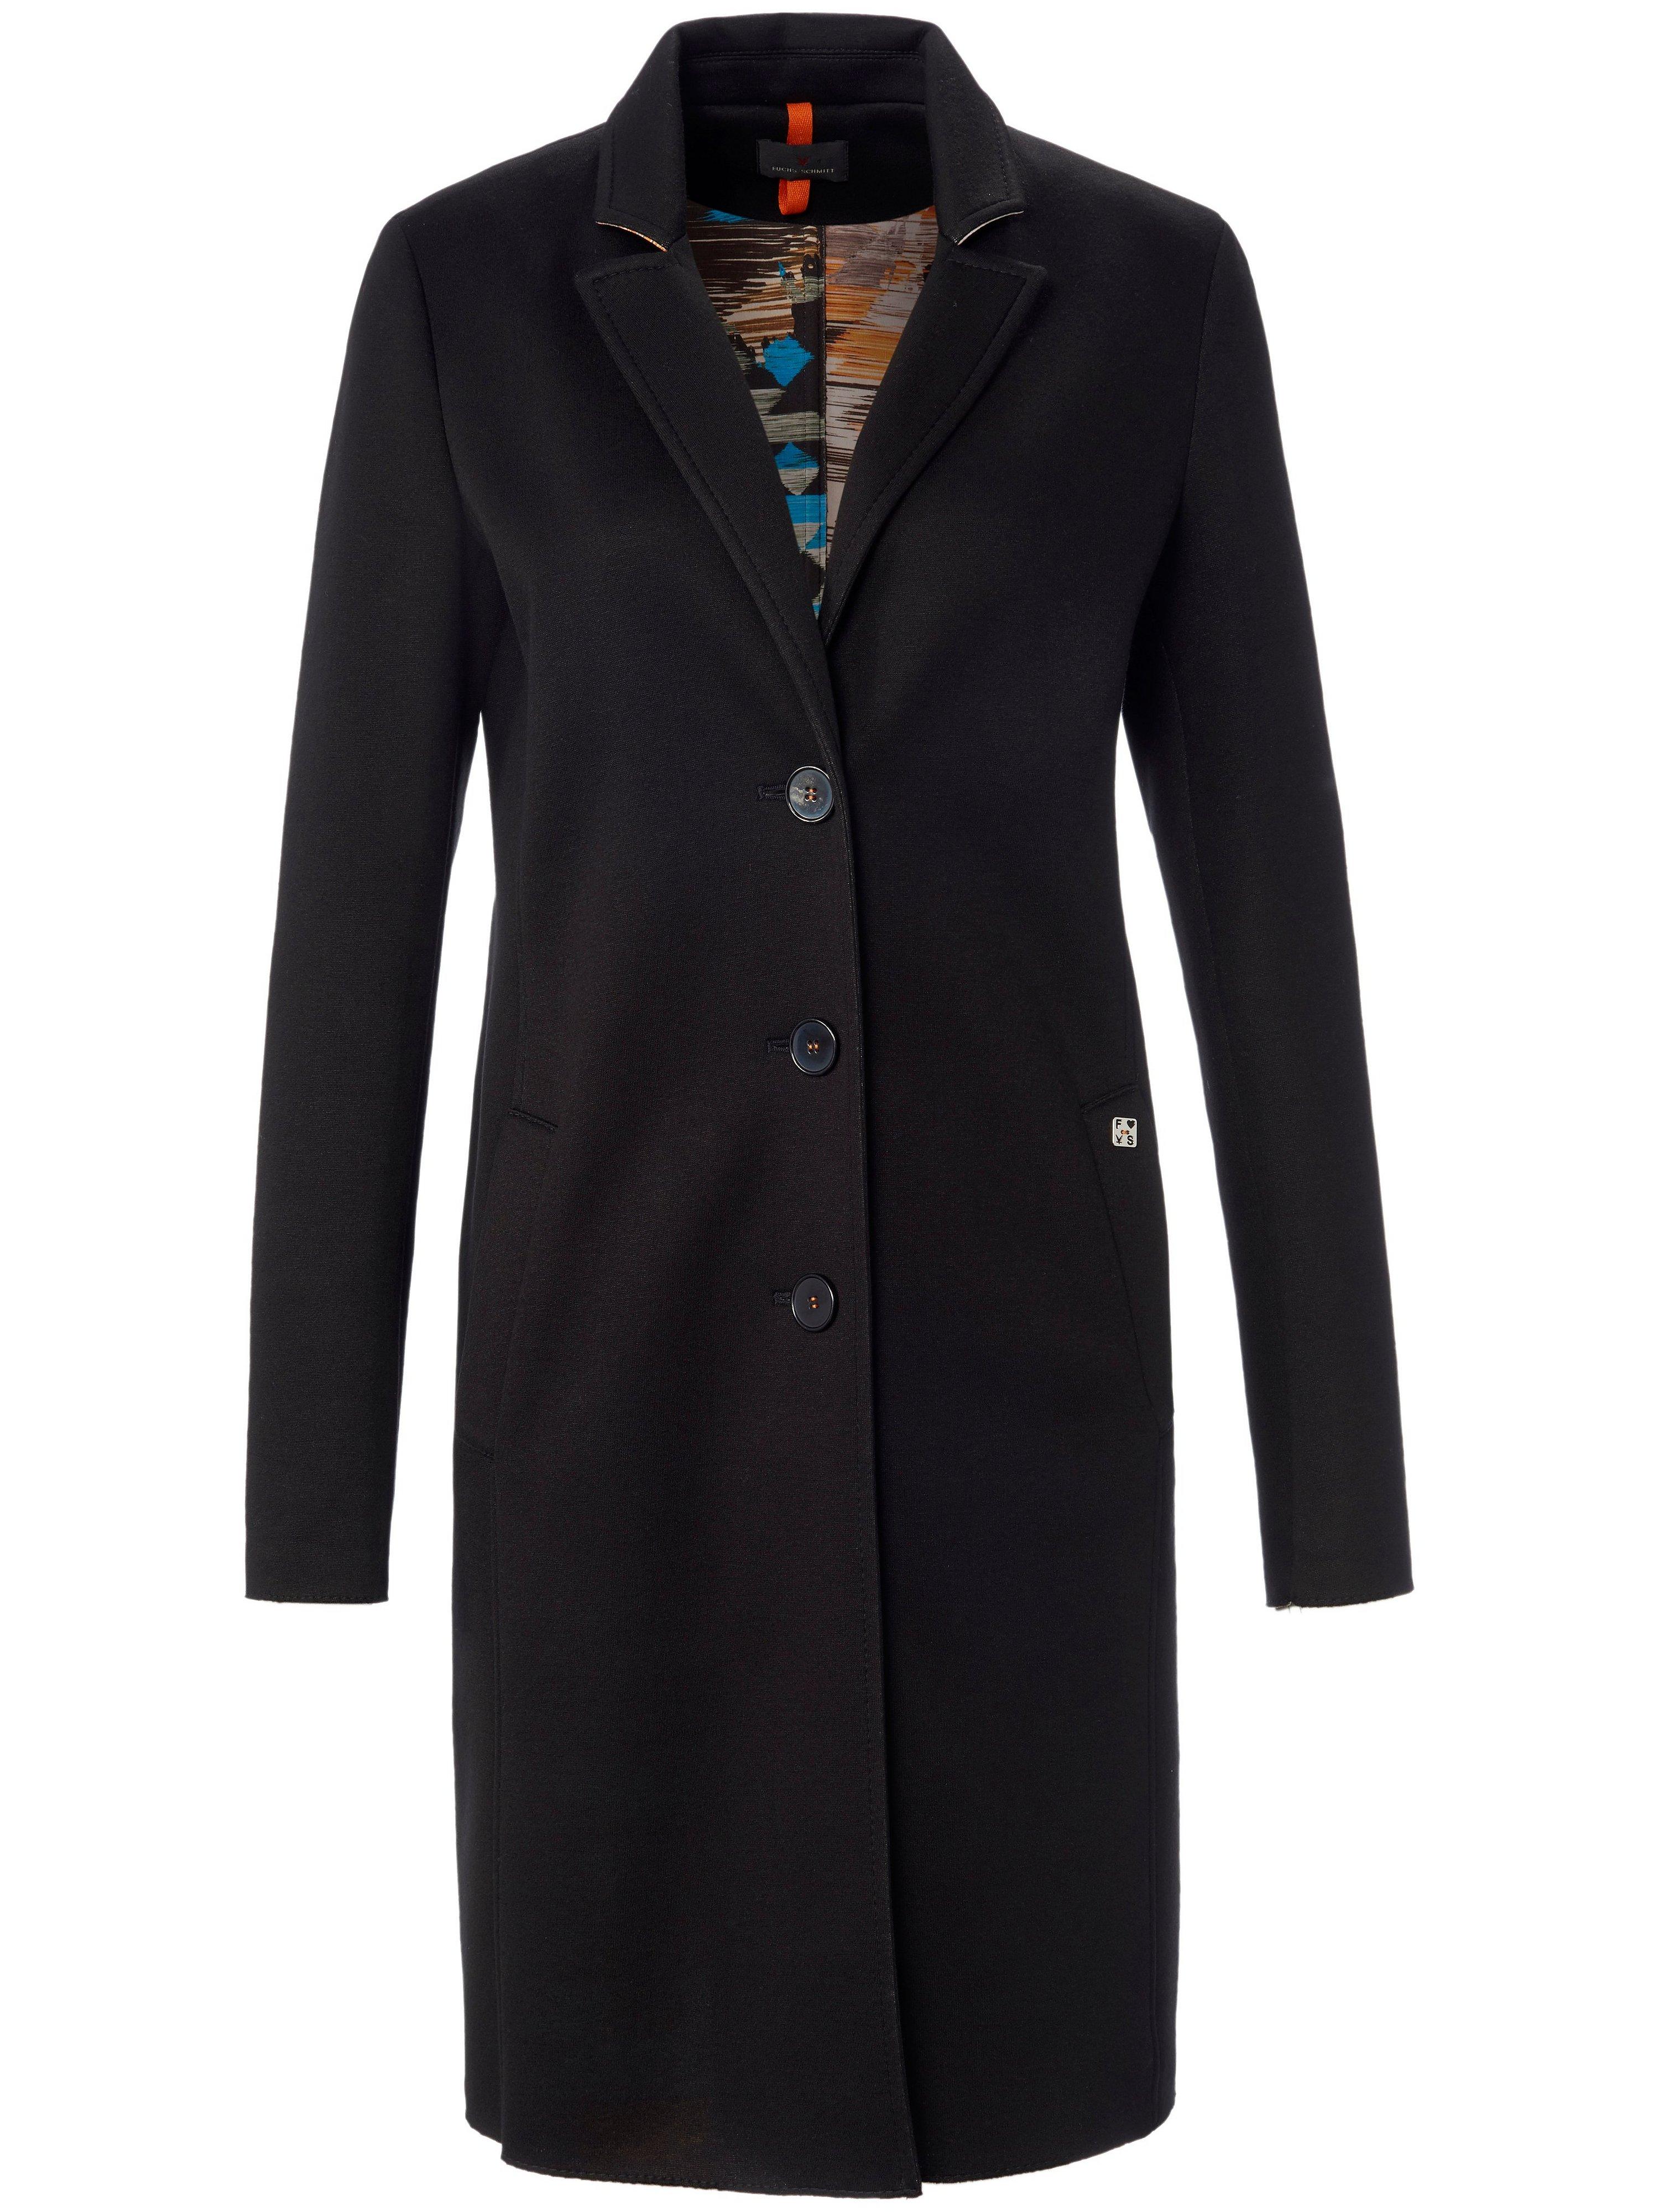 Le manteau 3/4 jersey scuba  Fuchs & Schmitt noir taille 48